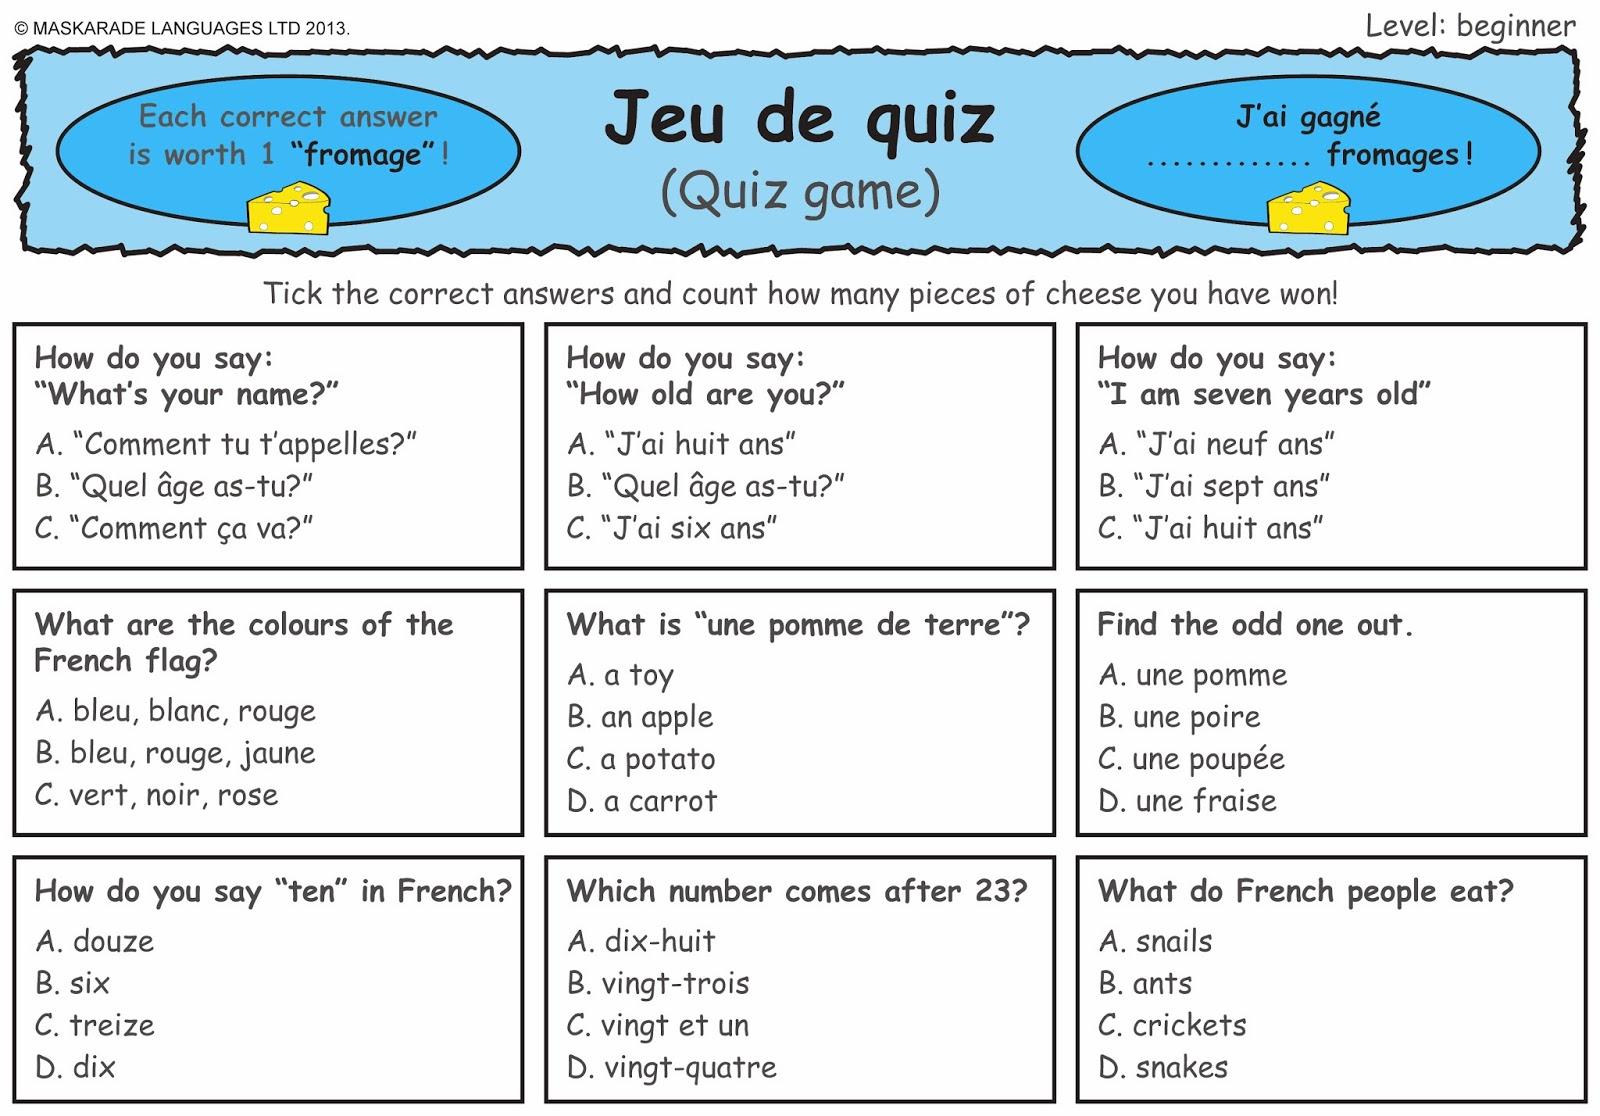 Maskarade Languages French Quiz